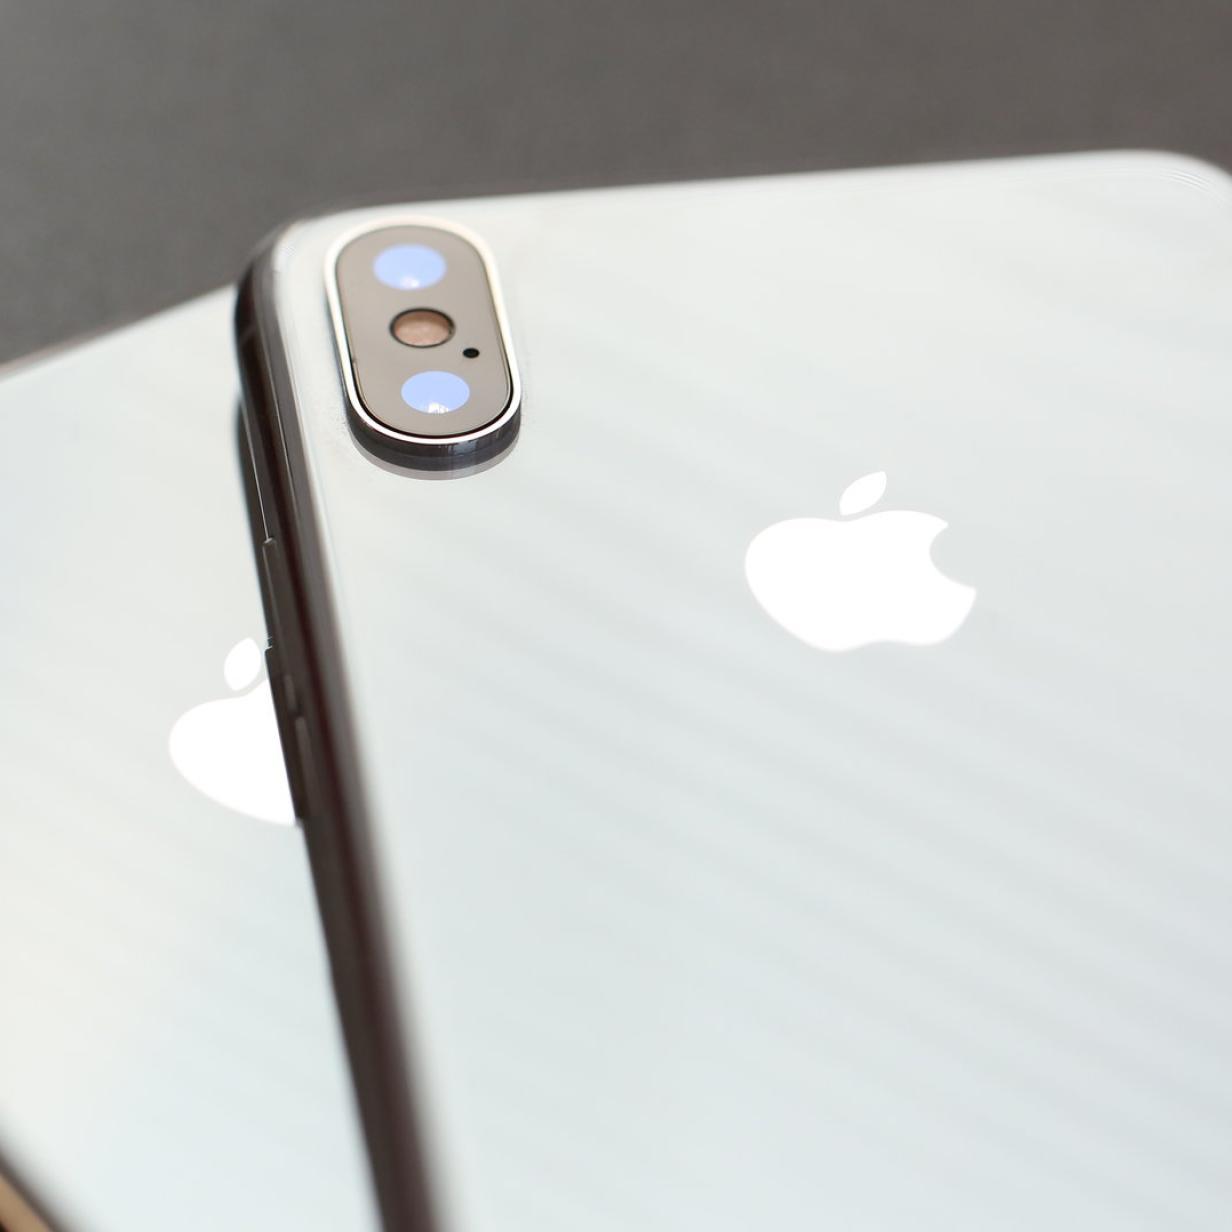 Apples Marktanteil bei Smartphones sinkt stark